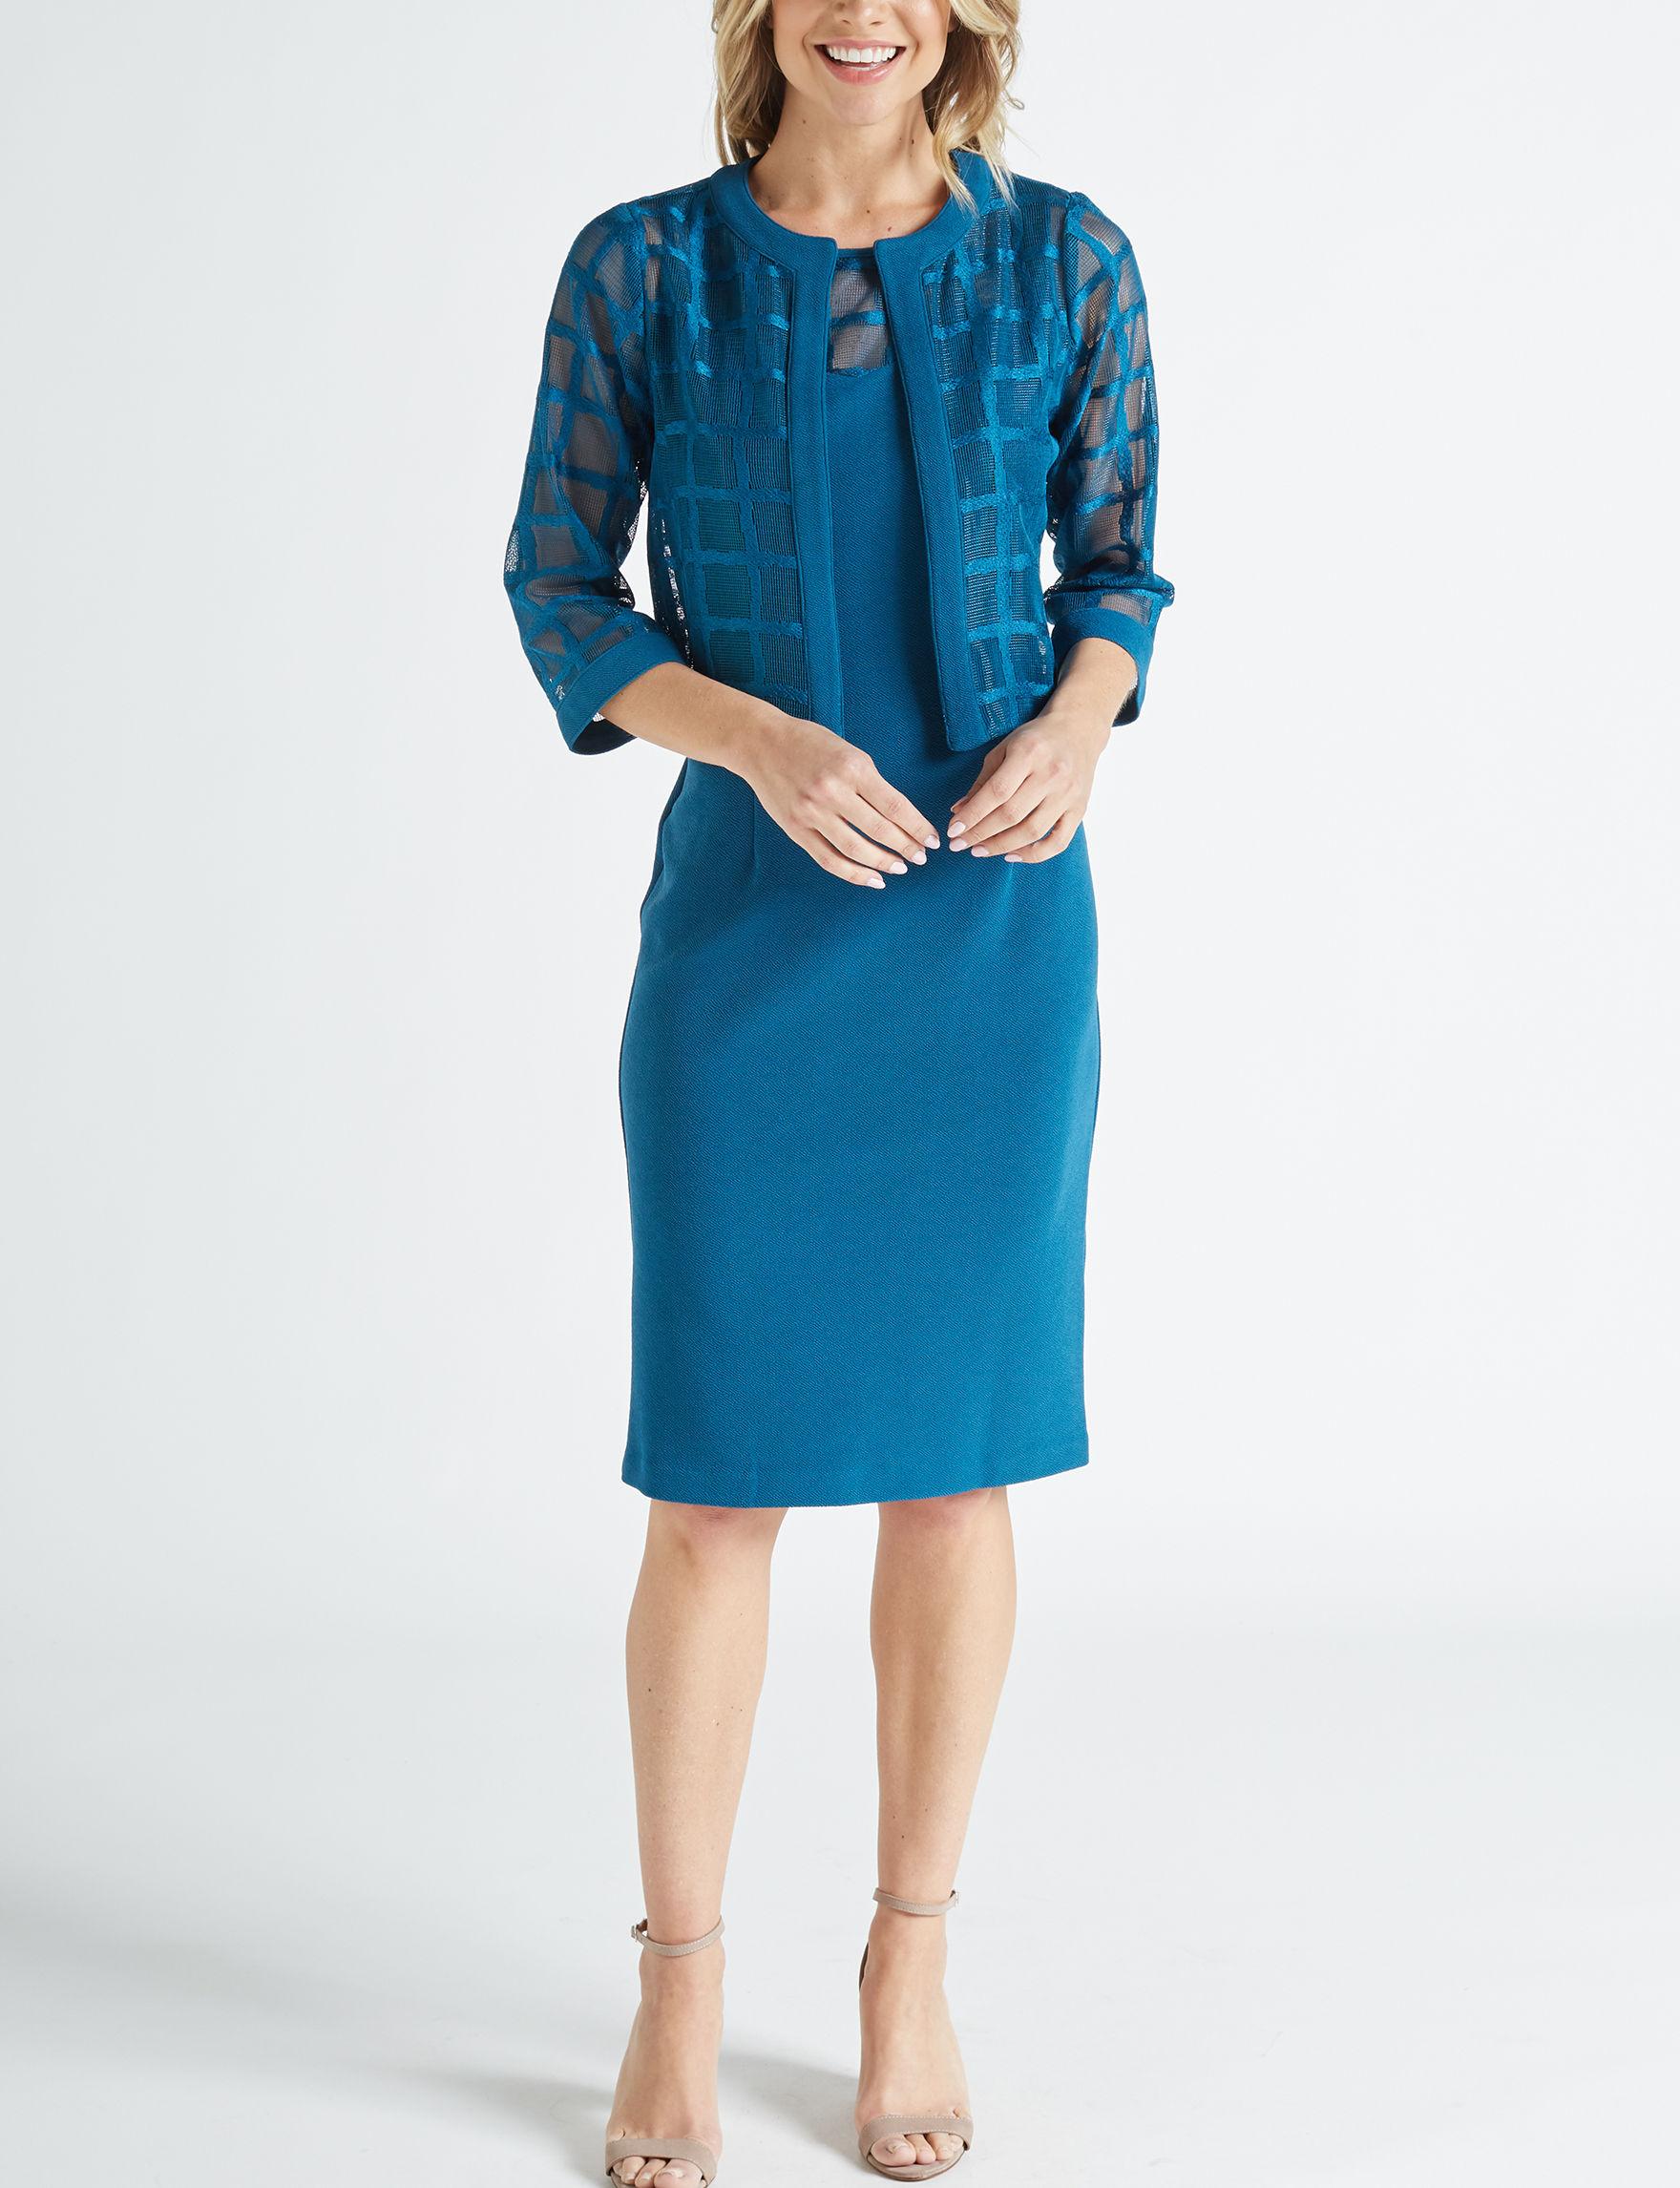 Maya Brooke Medium Blue Everyday & Casual Jacket Dresses